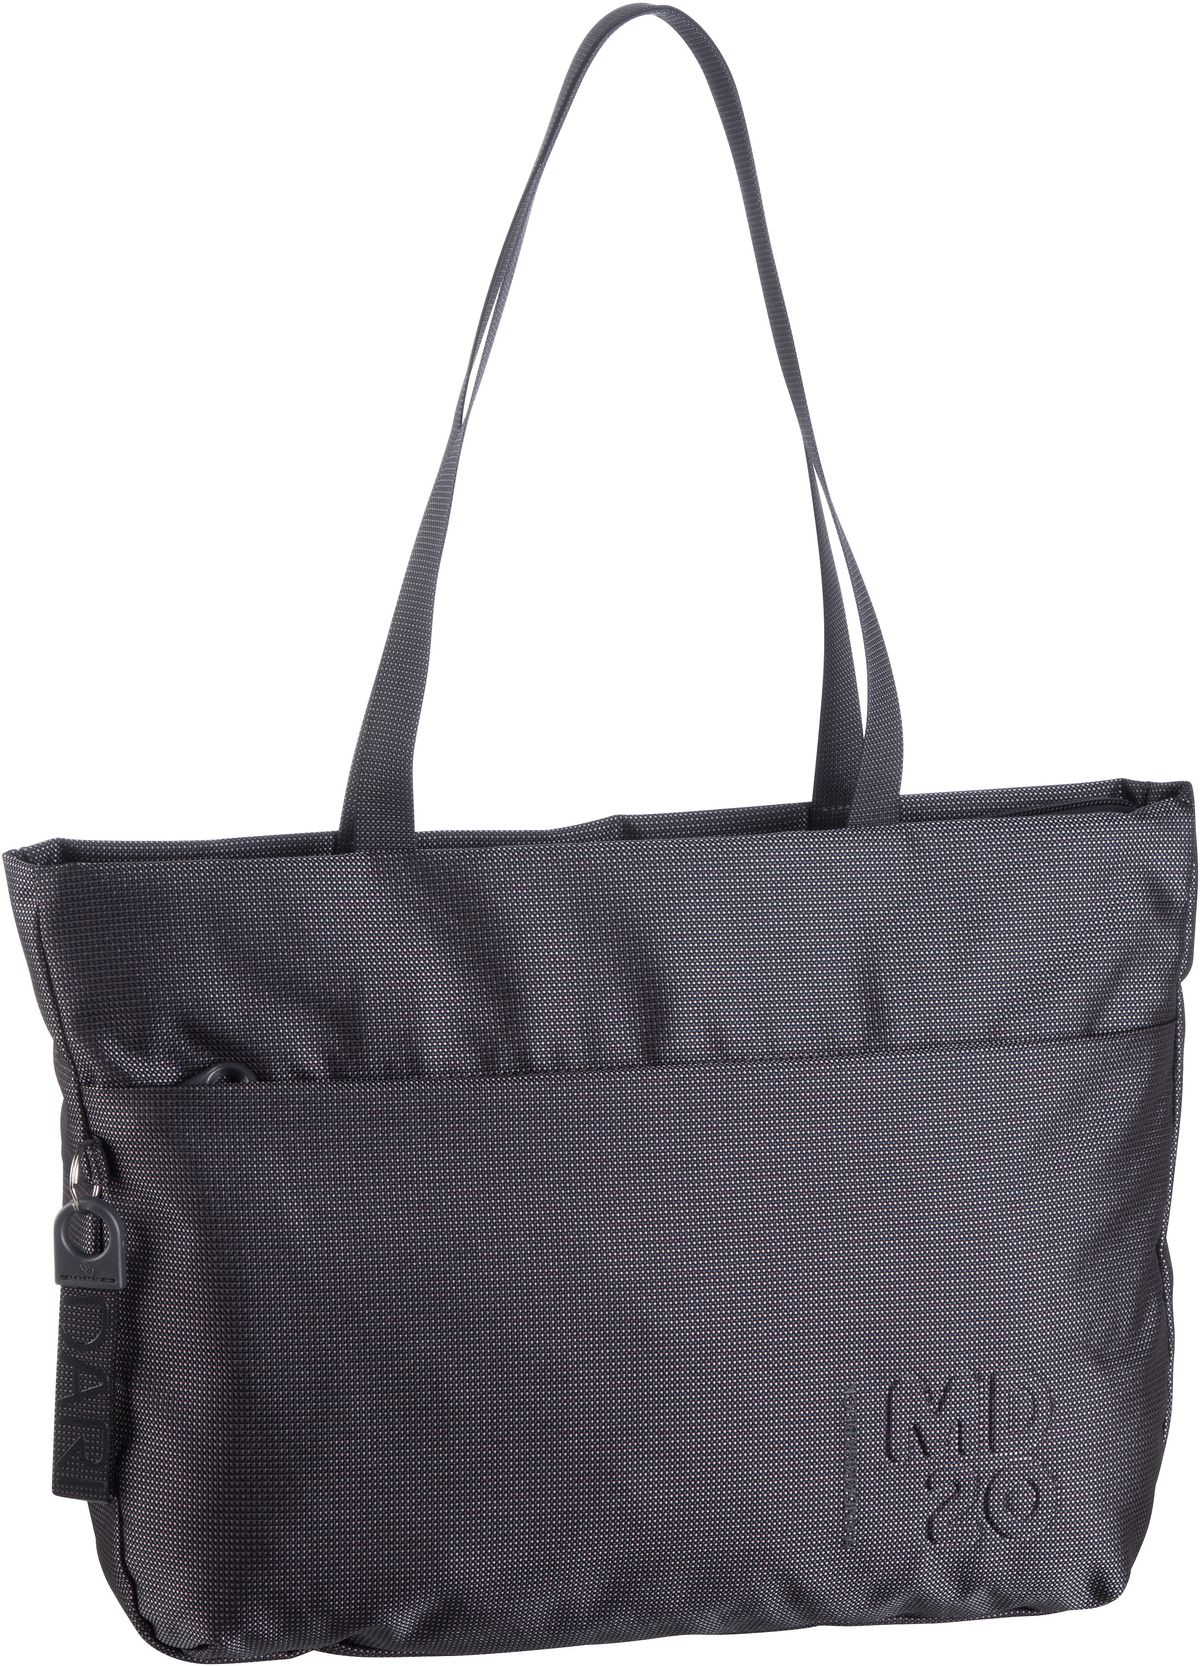 Handtasche MD20 Shoulder Bag QMT14 Steel